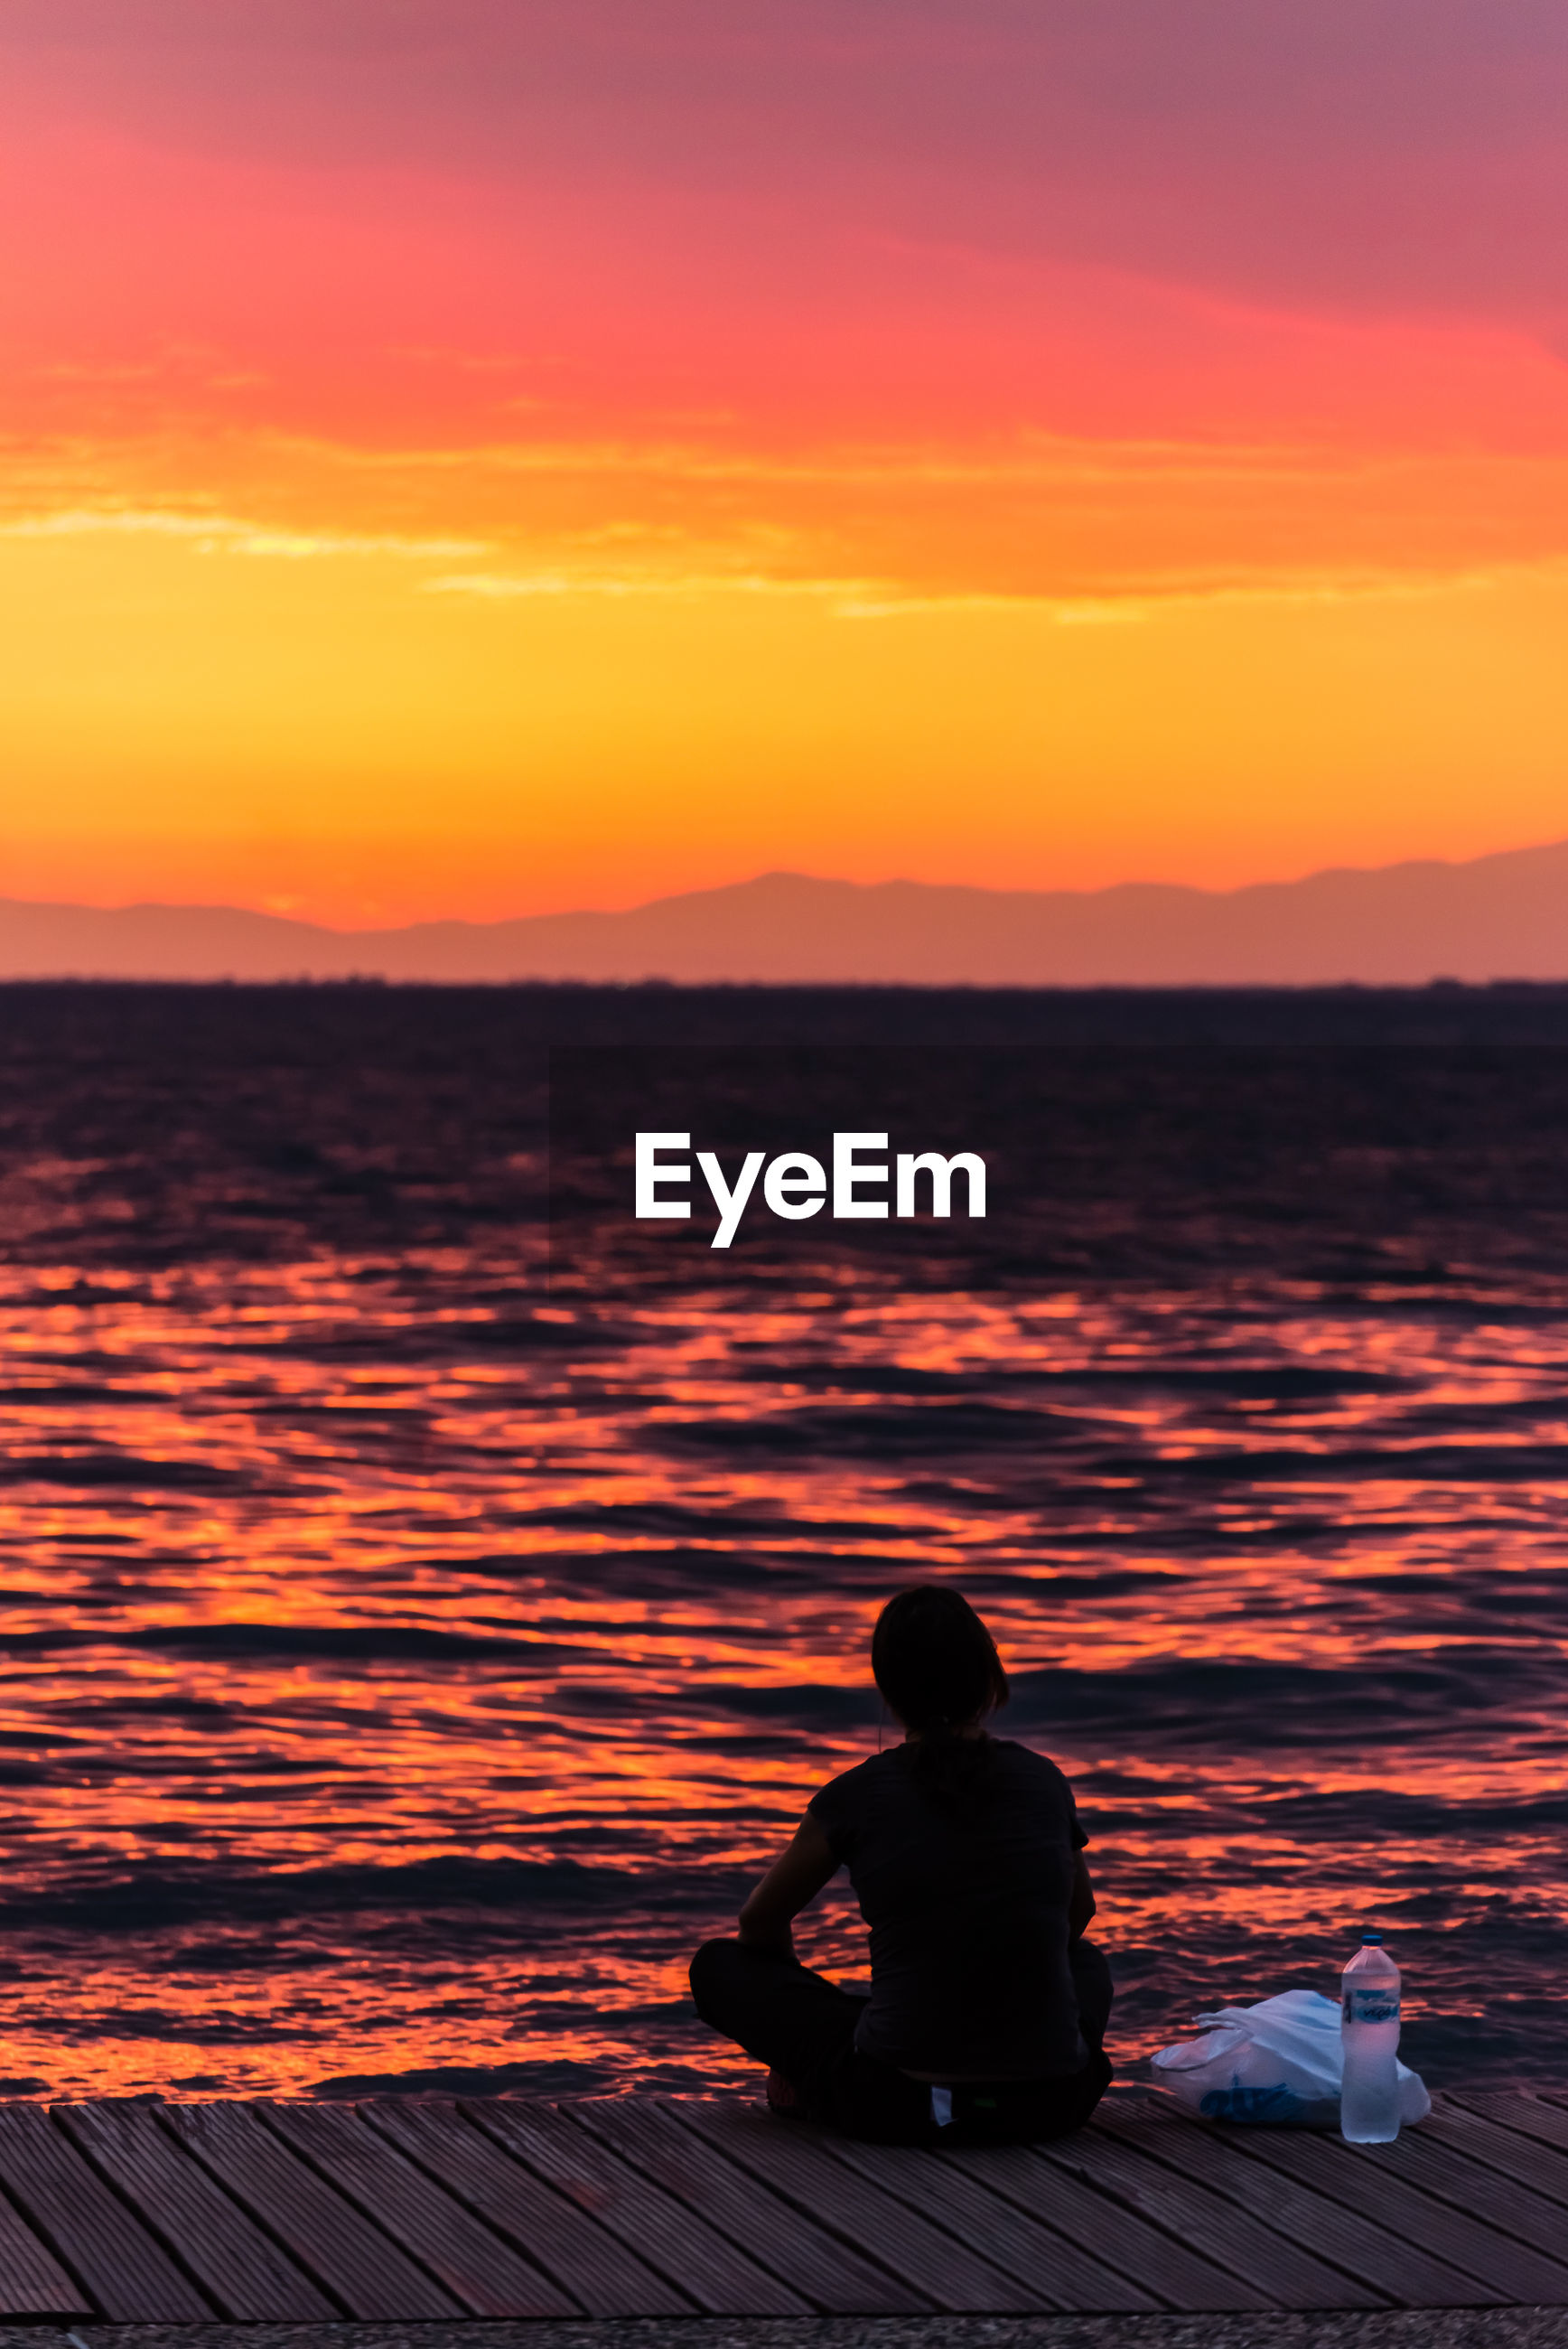 SILHOUETTE MAN SITTING ON SEA AGAINST ORANGE SKY